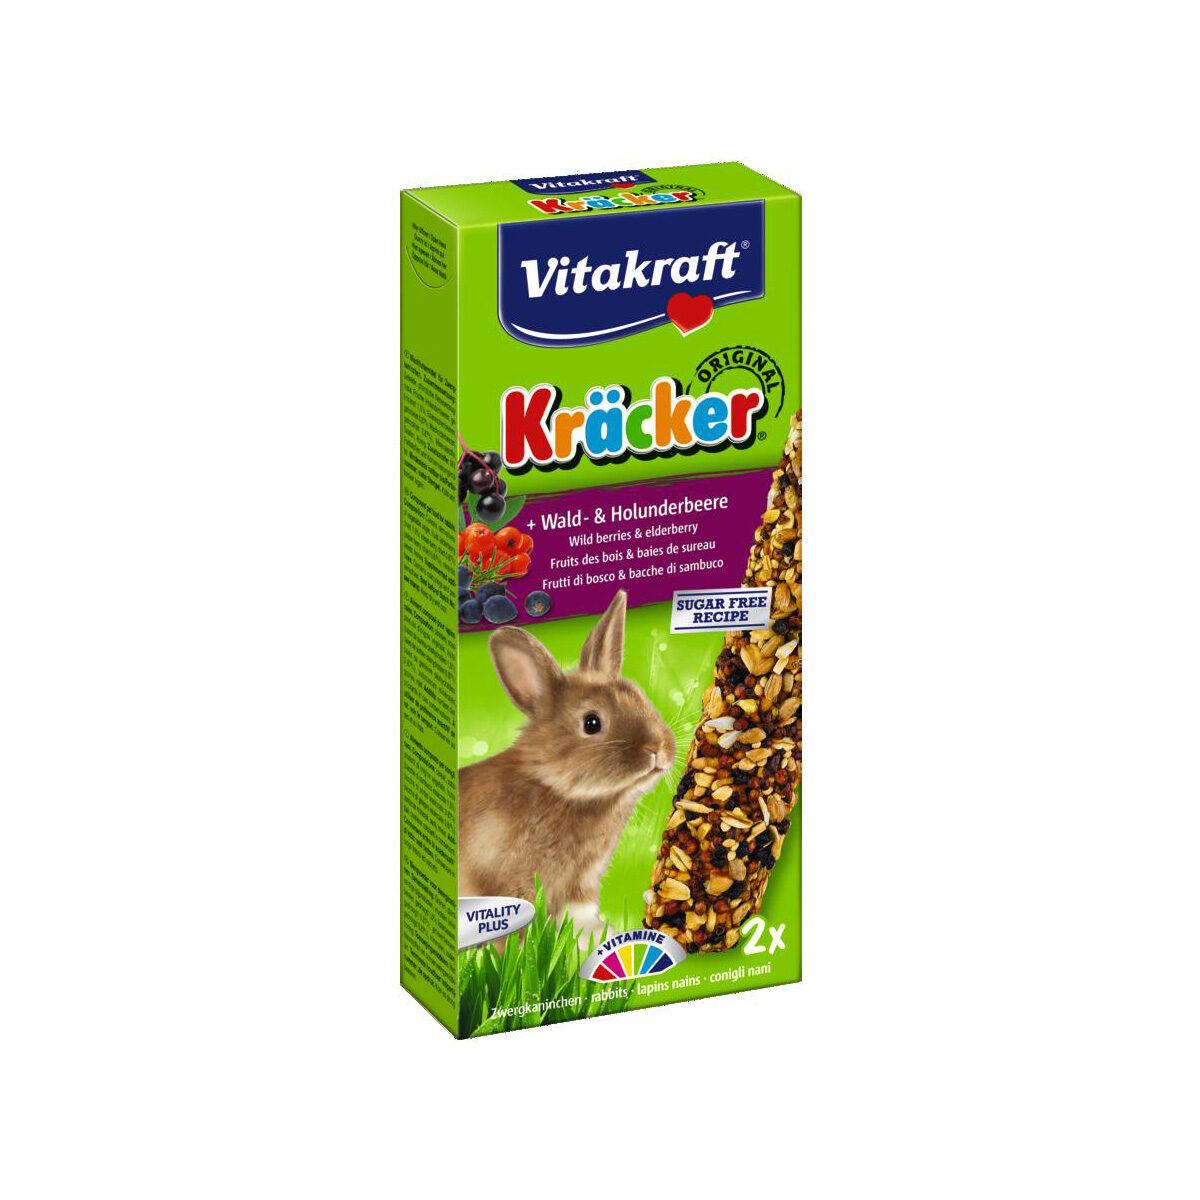 Vitakraft Kräcker Konijnensnack 2-in-1 Groente&Bieten